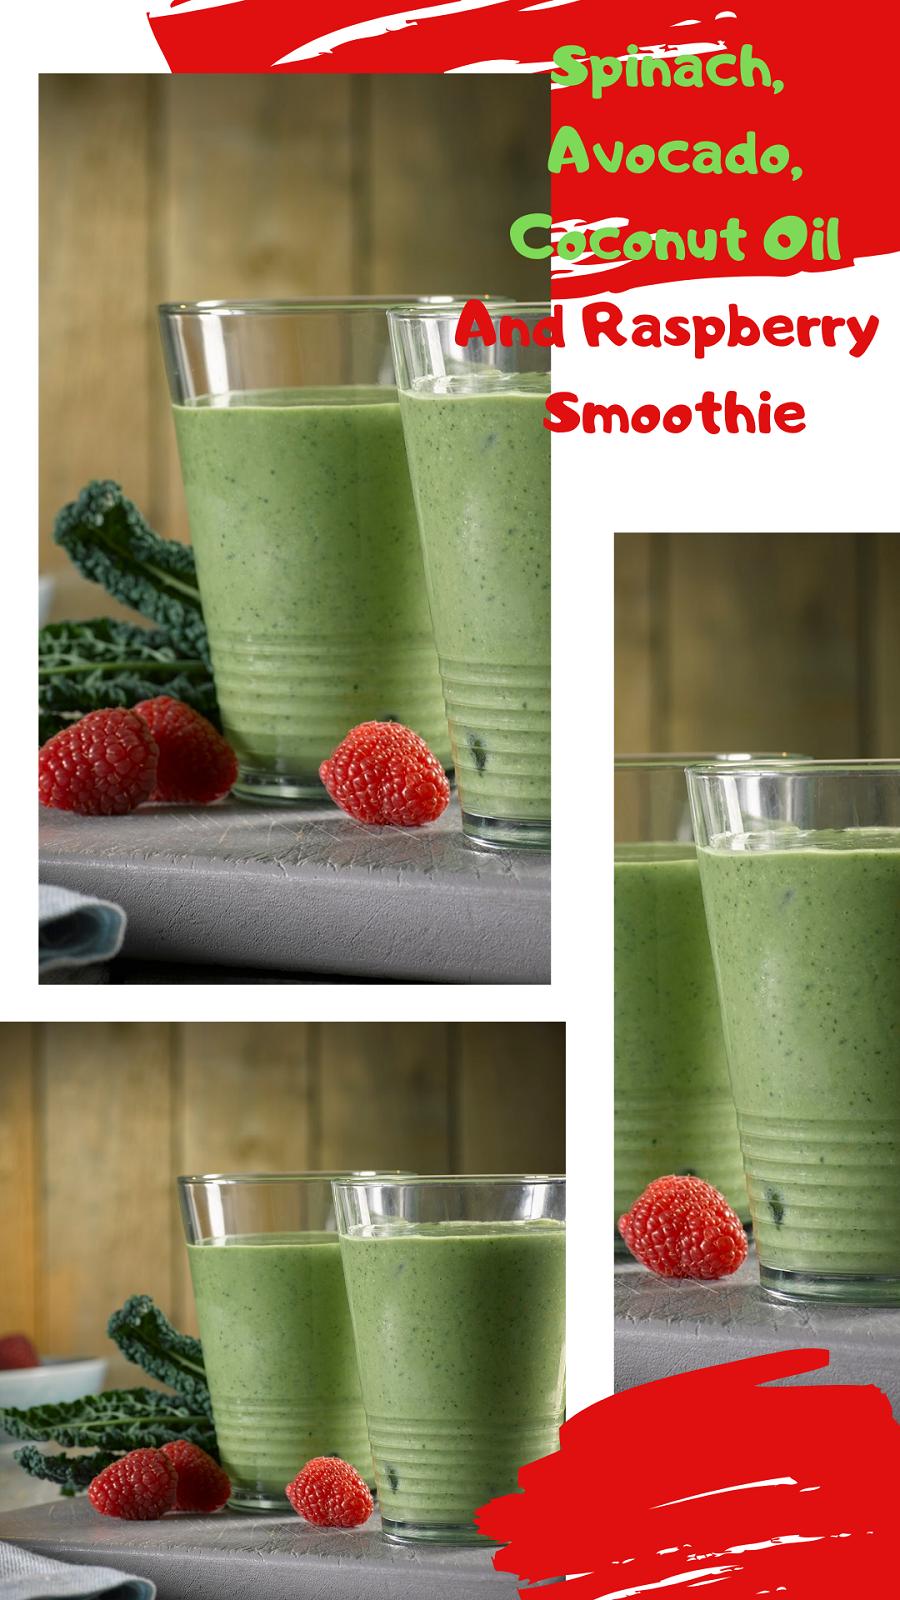 Spinach, Avocado, Coconut Oil And Raspberry Smoothie